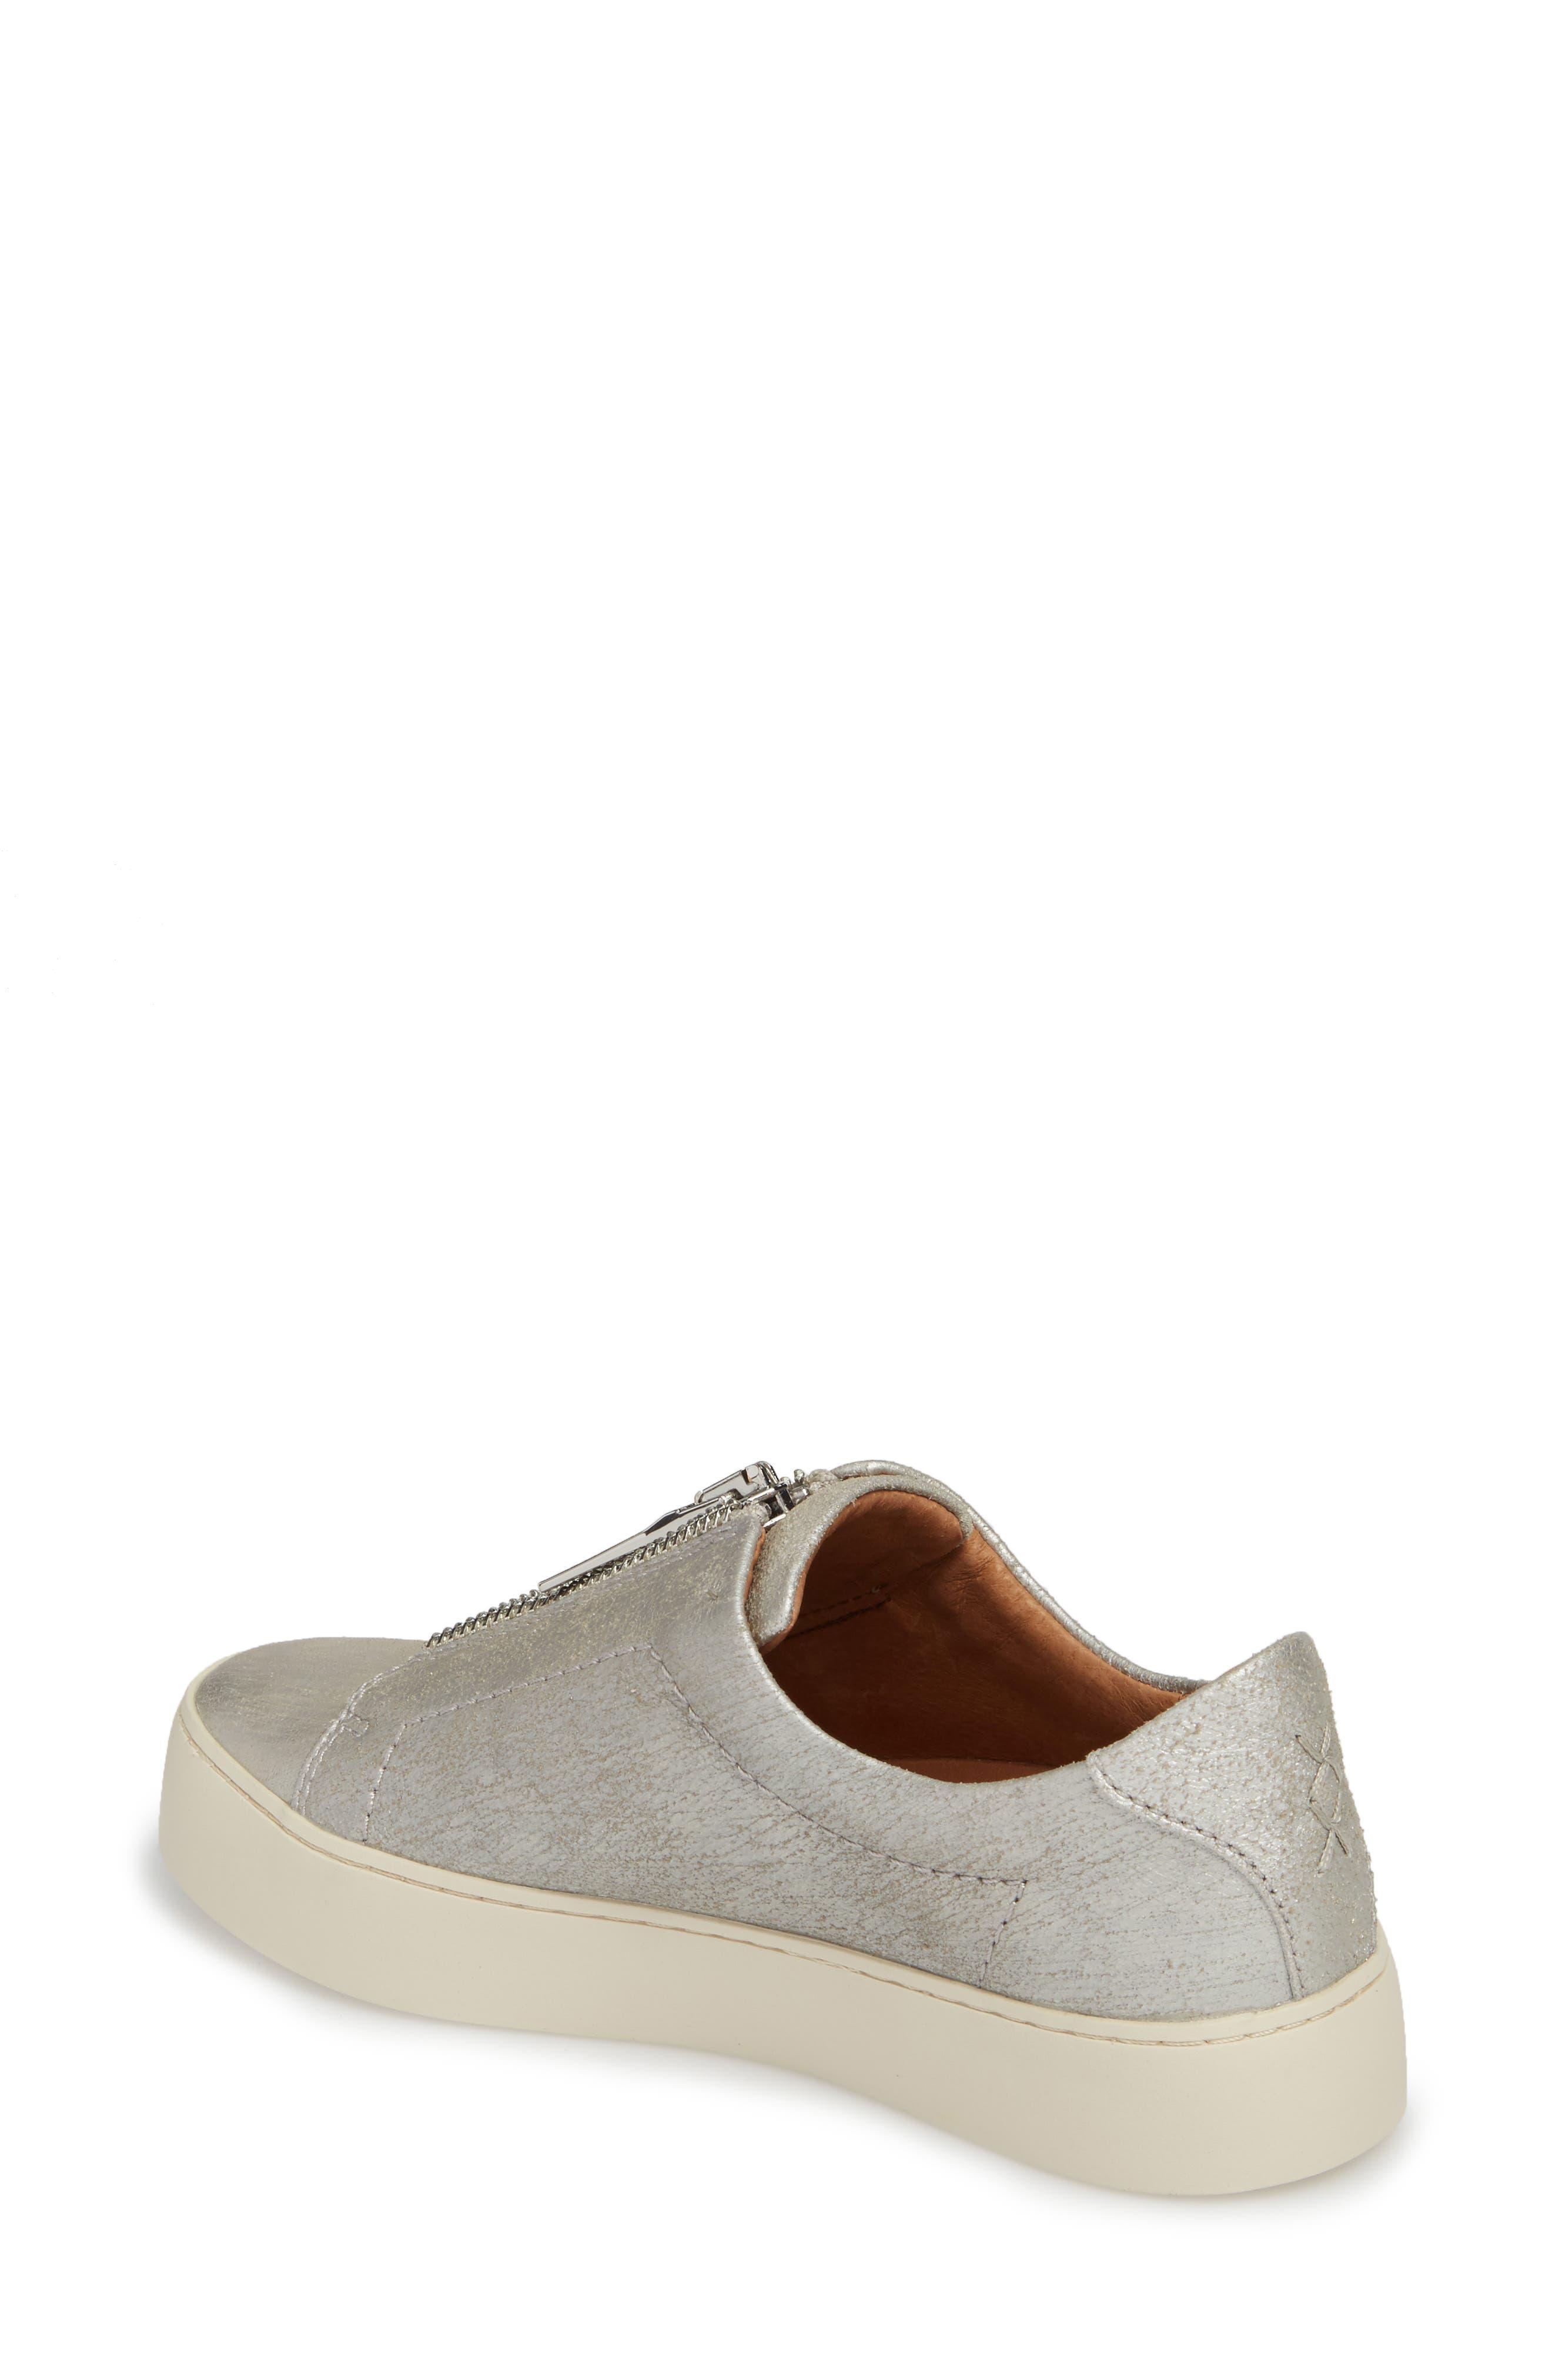 Lena Zip Sneaker,                             Alternate thumbnail 2, color,                             Silver Leather